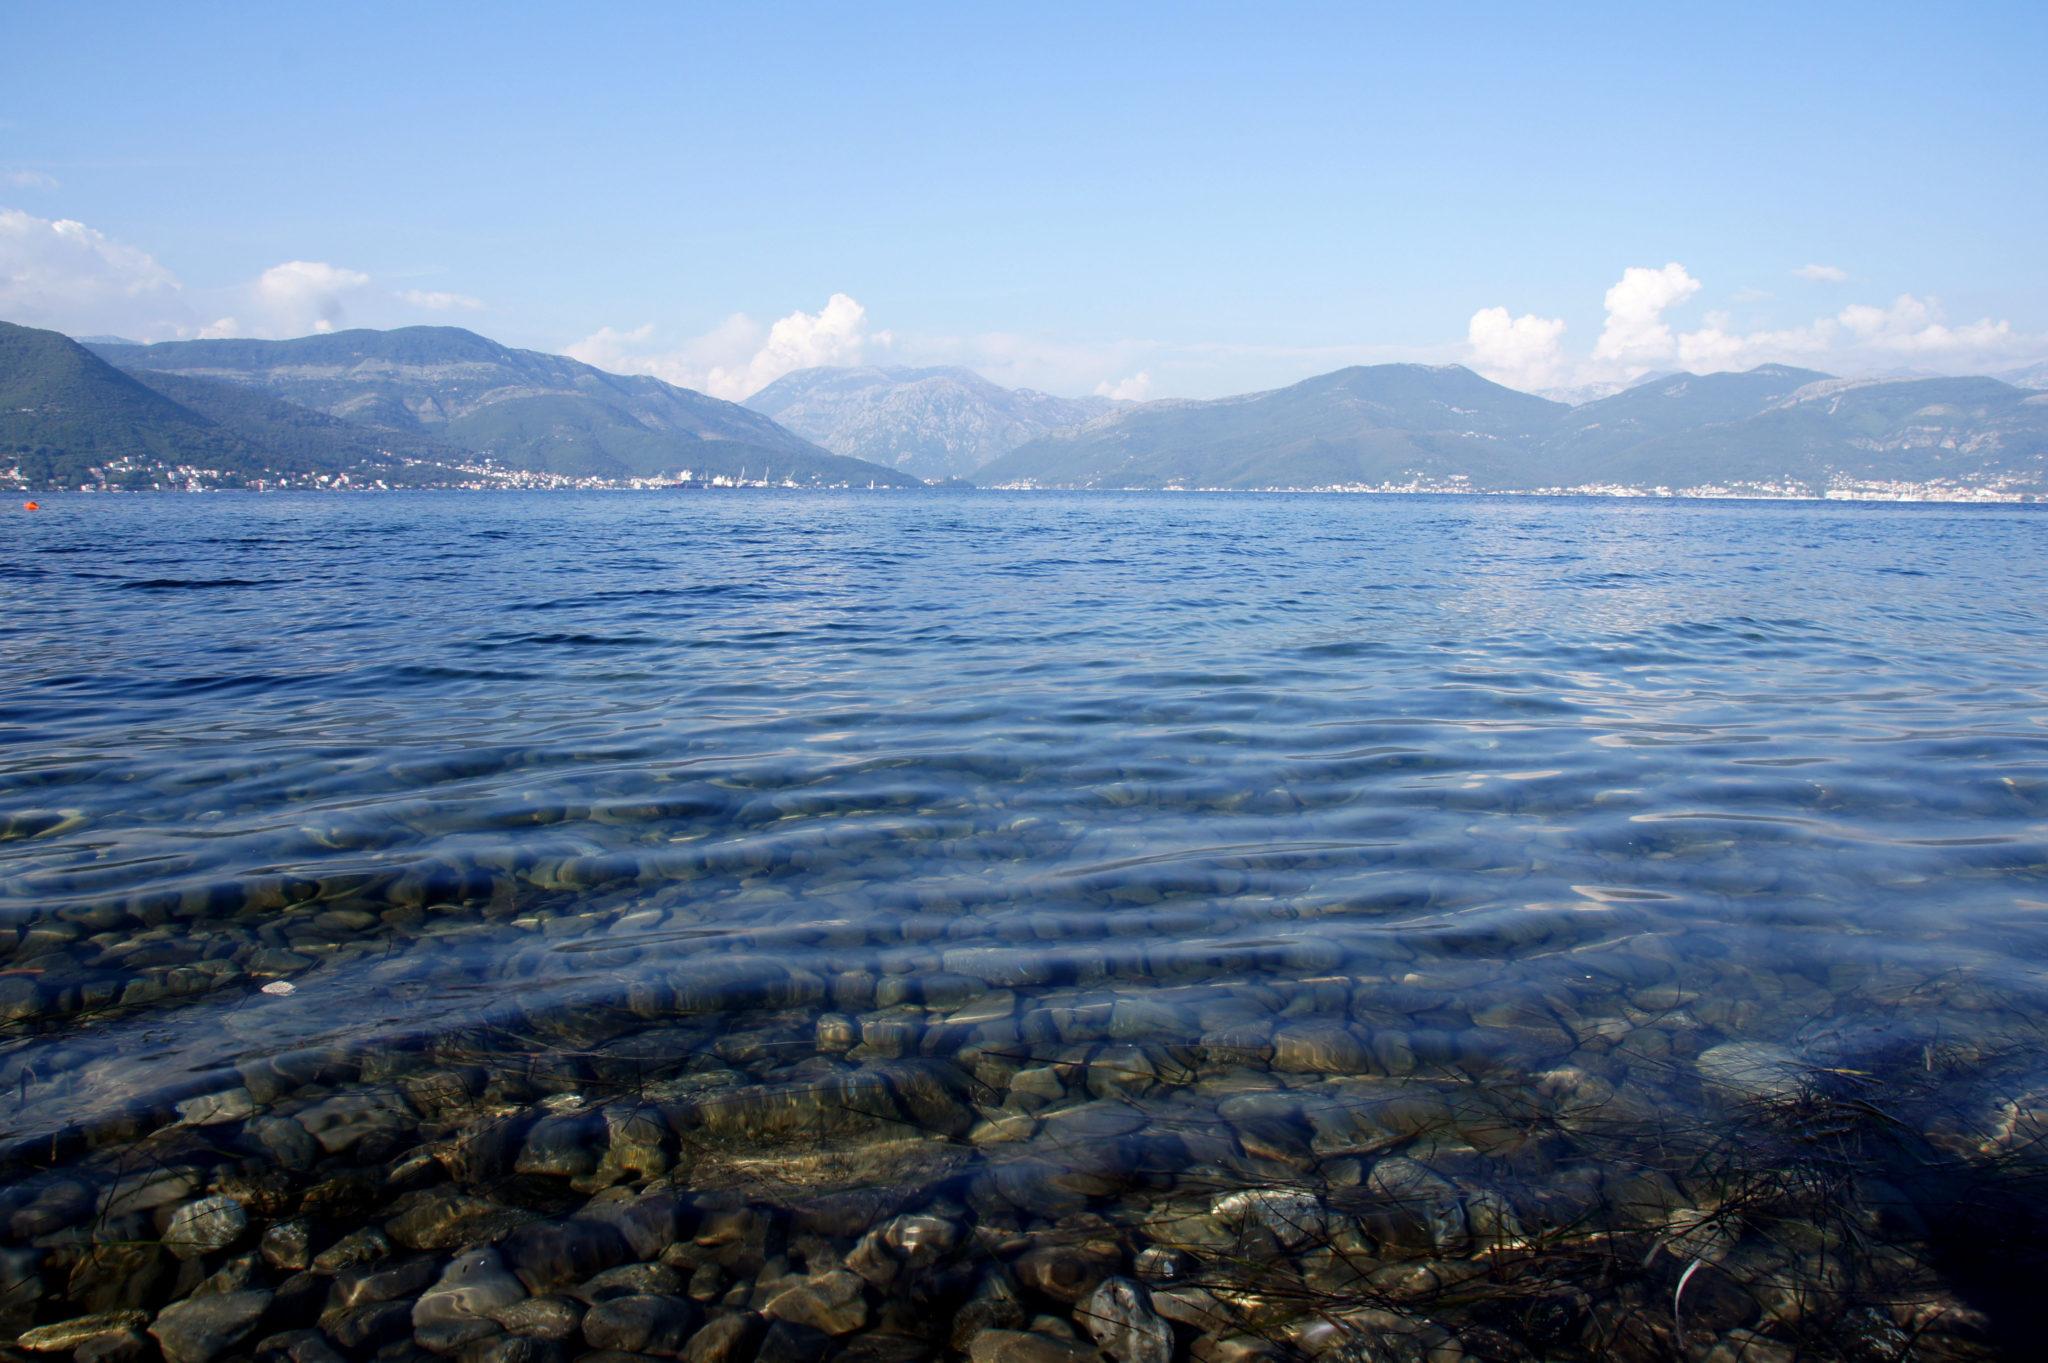 Hema_Montenegro_Lustica_peninsula_bouches_de_kotor_blog_voyage_travel5